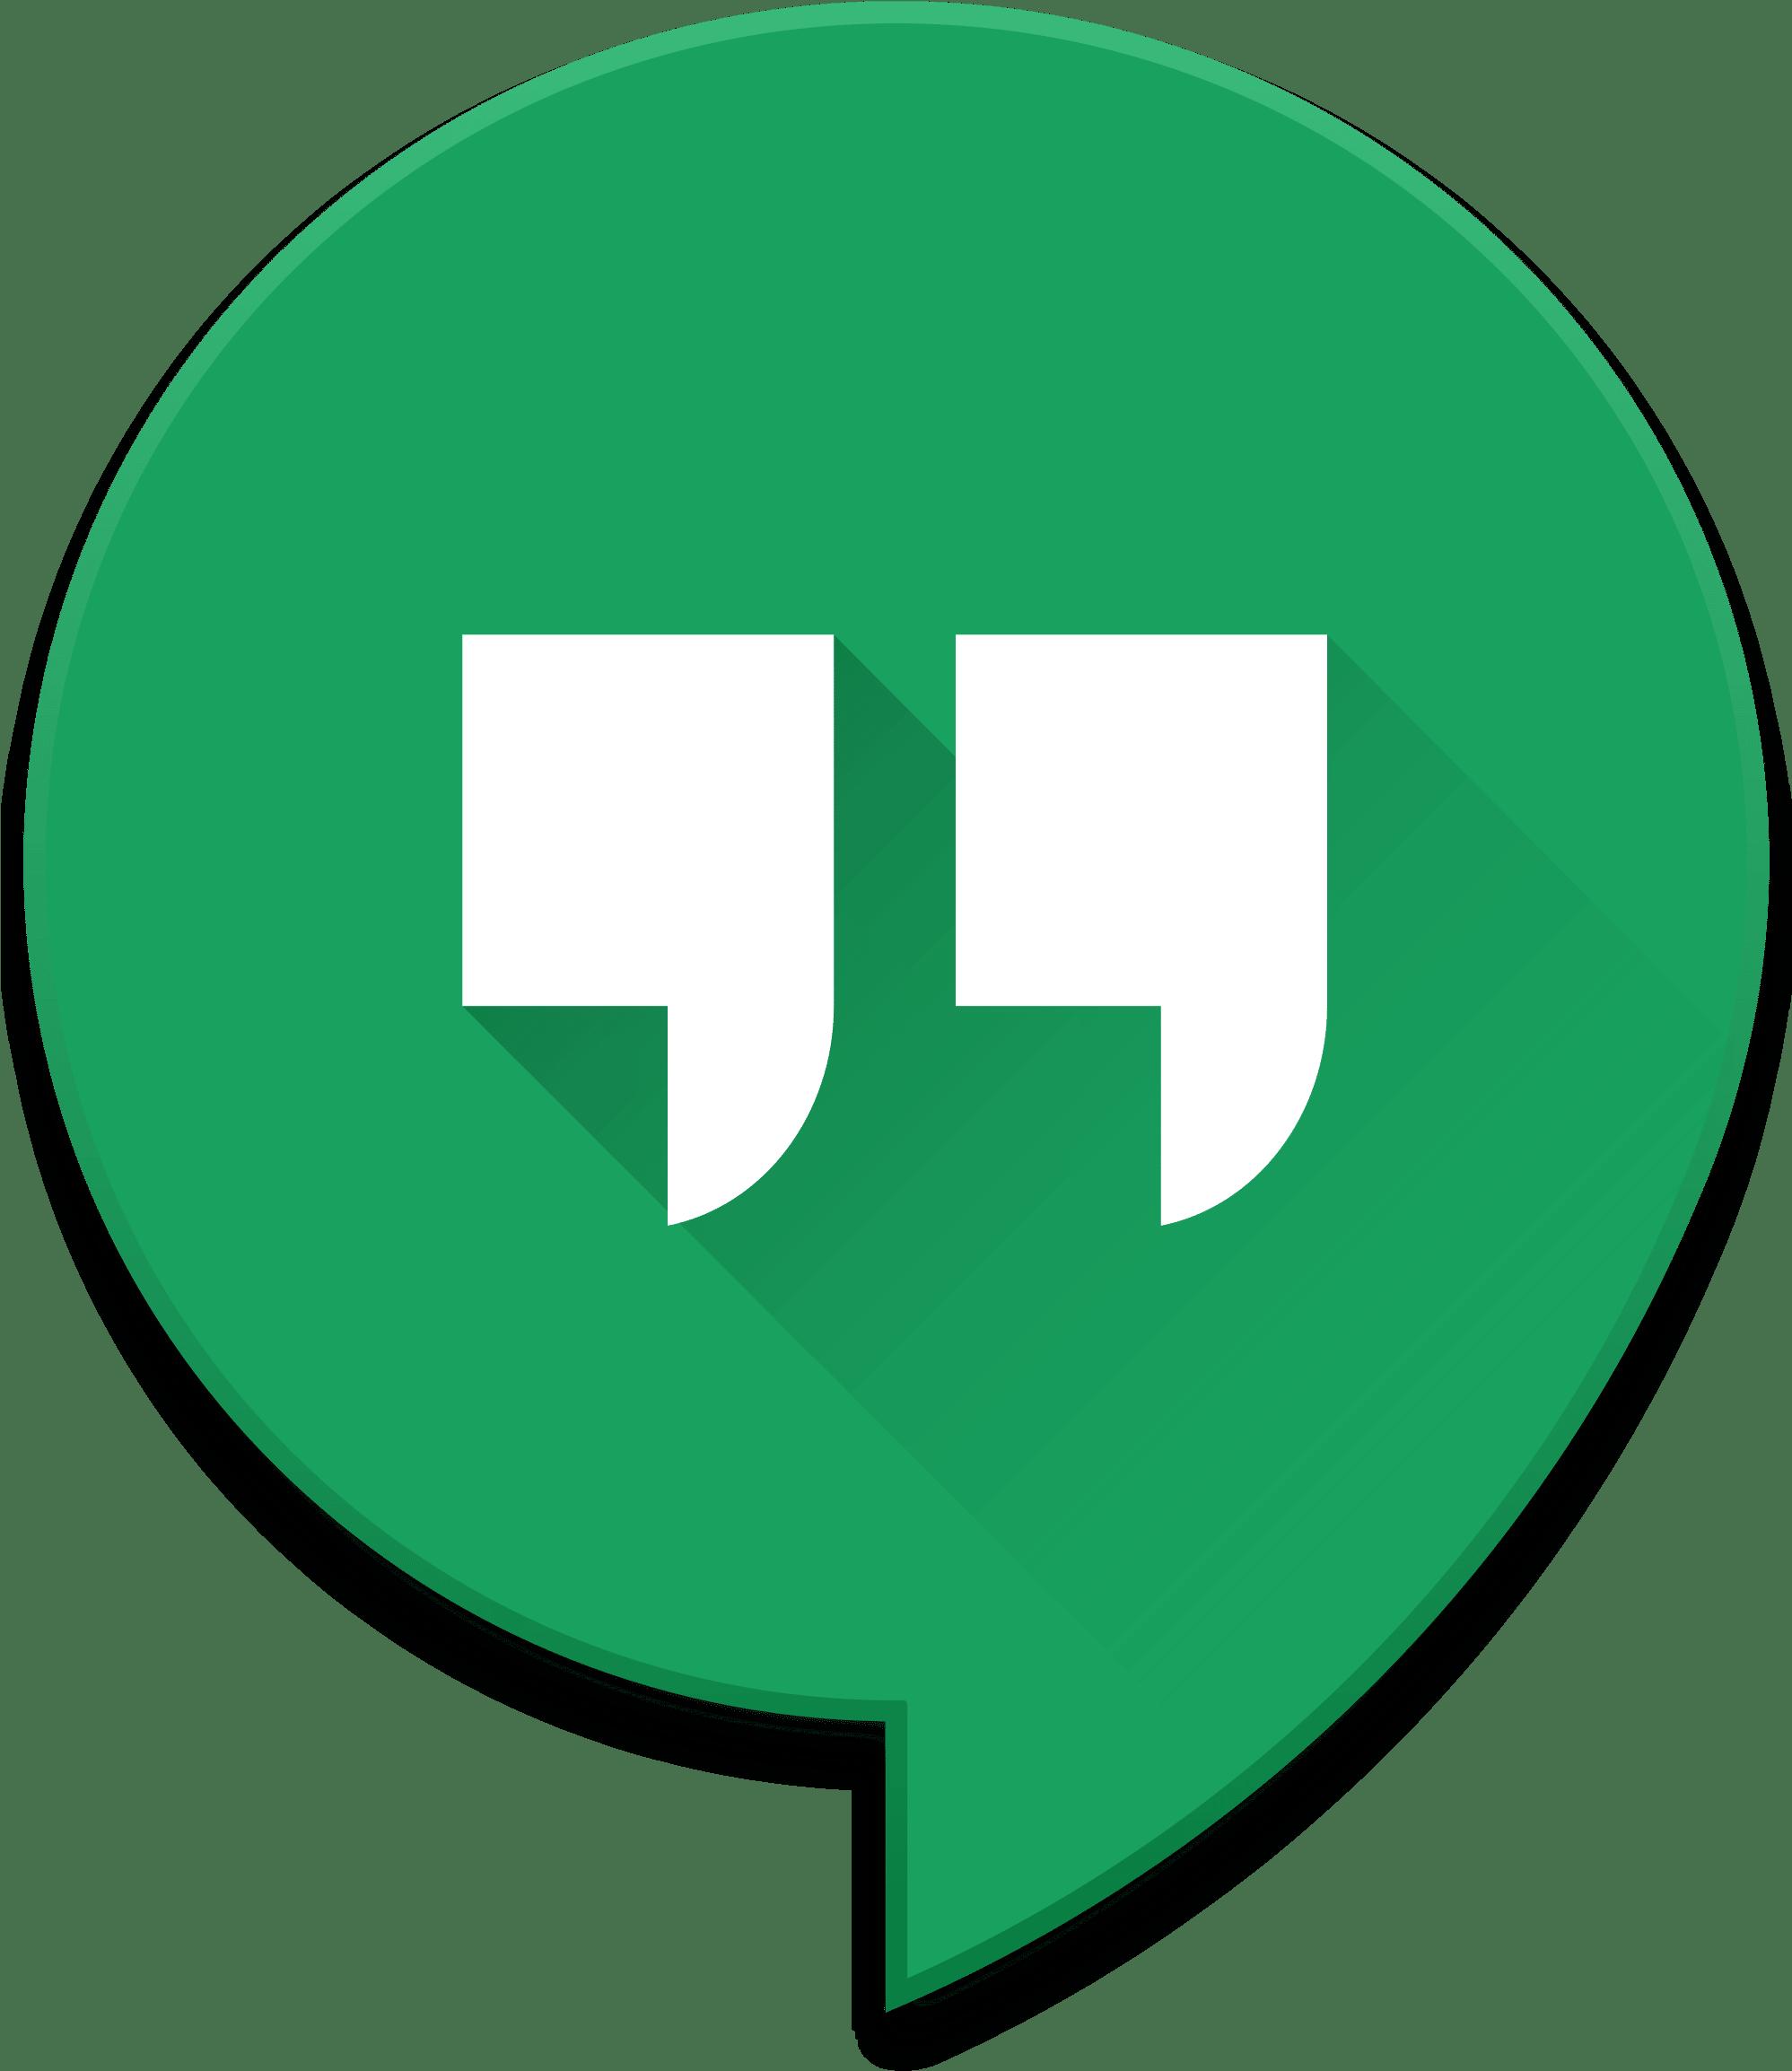 Docs, Sheets and Slides - Google Apps for Work